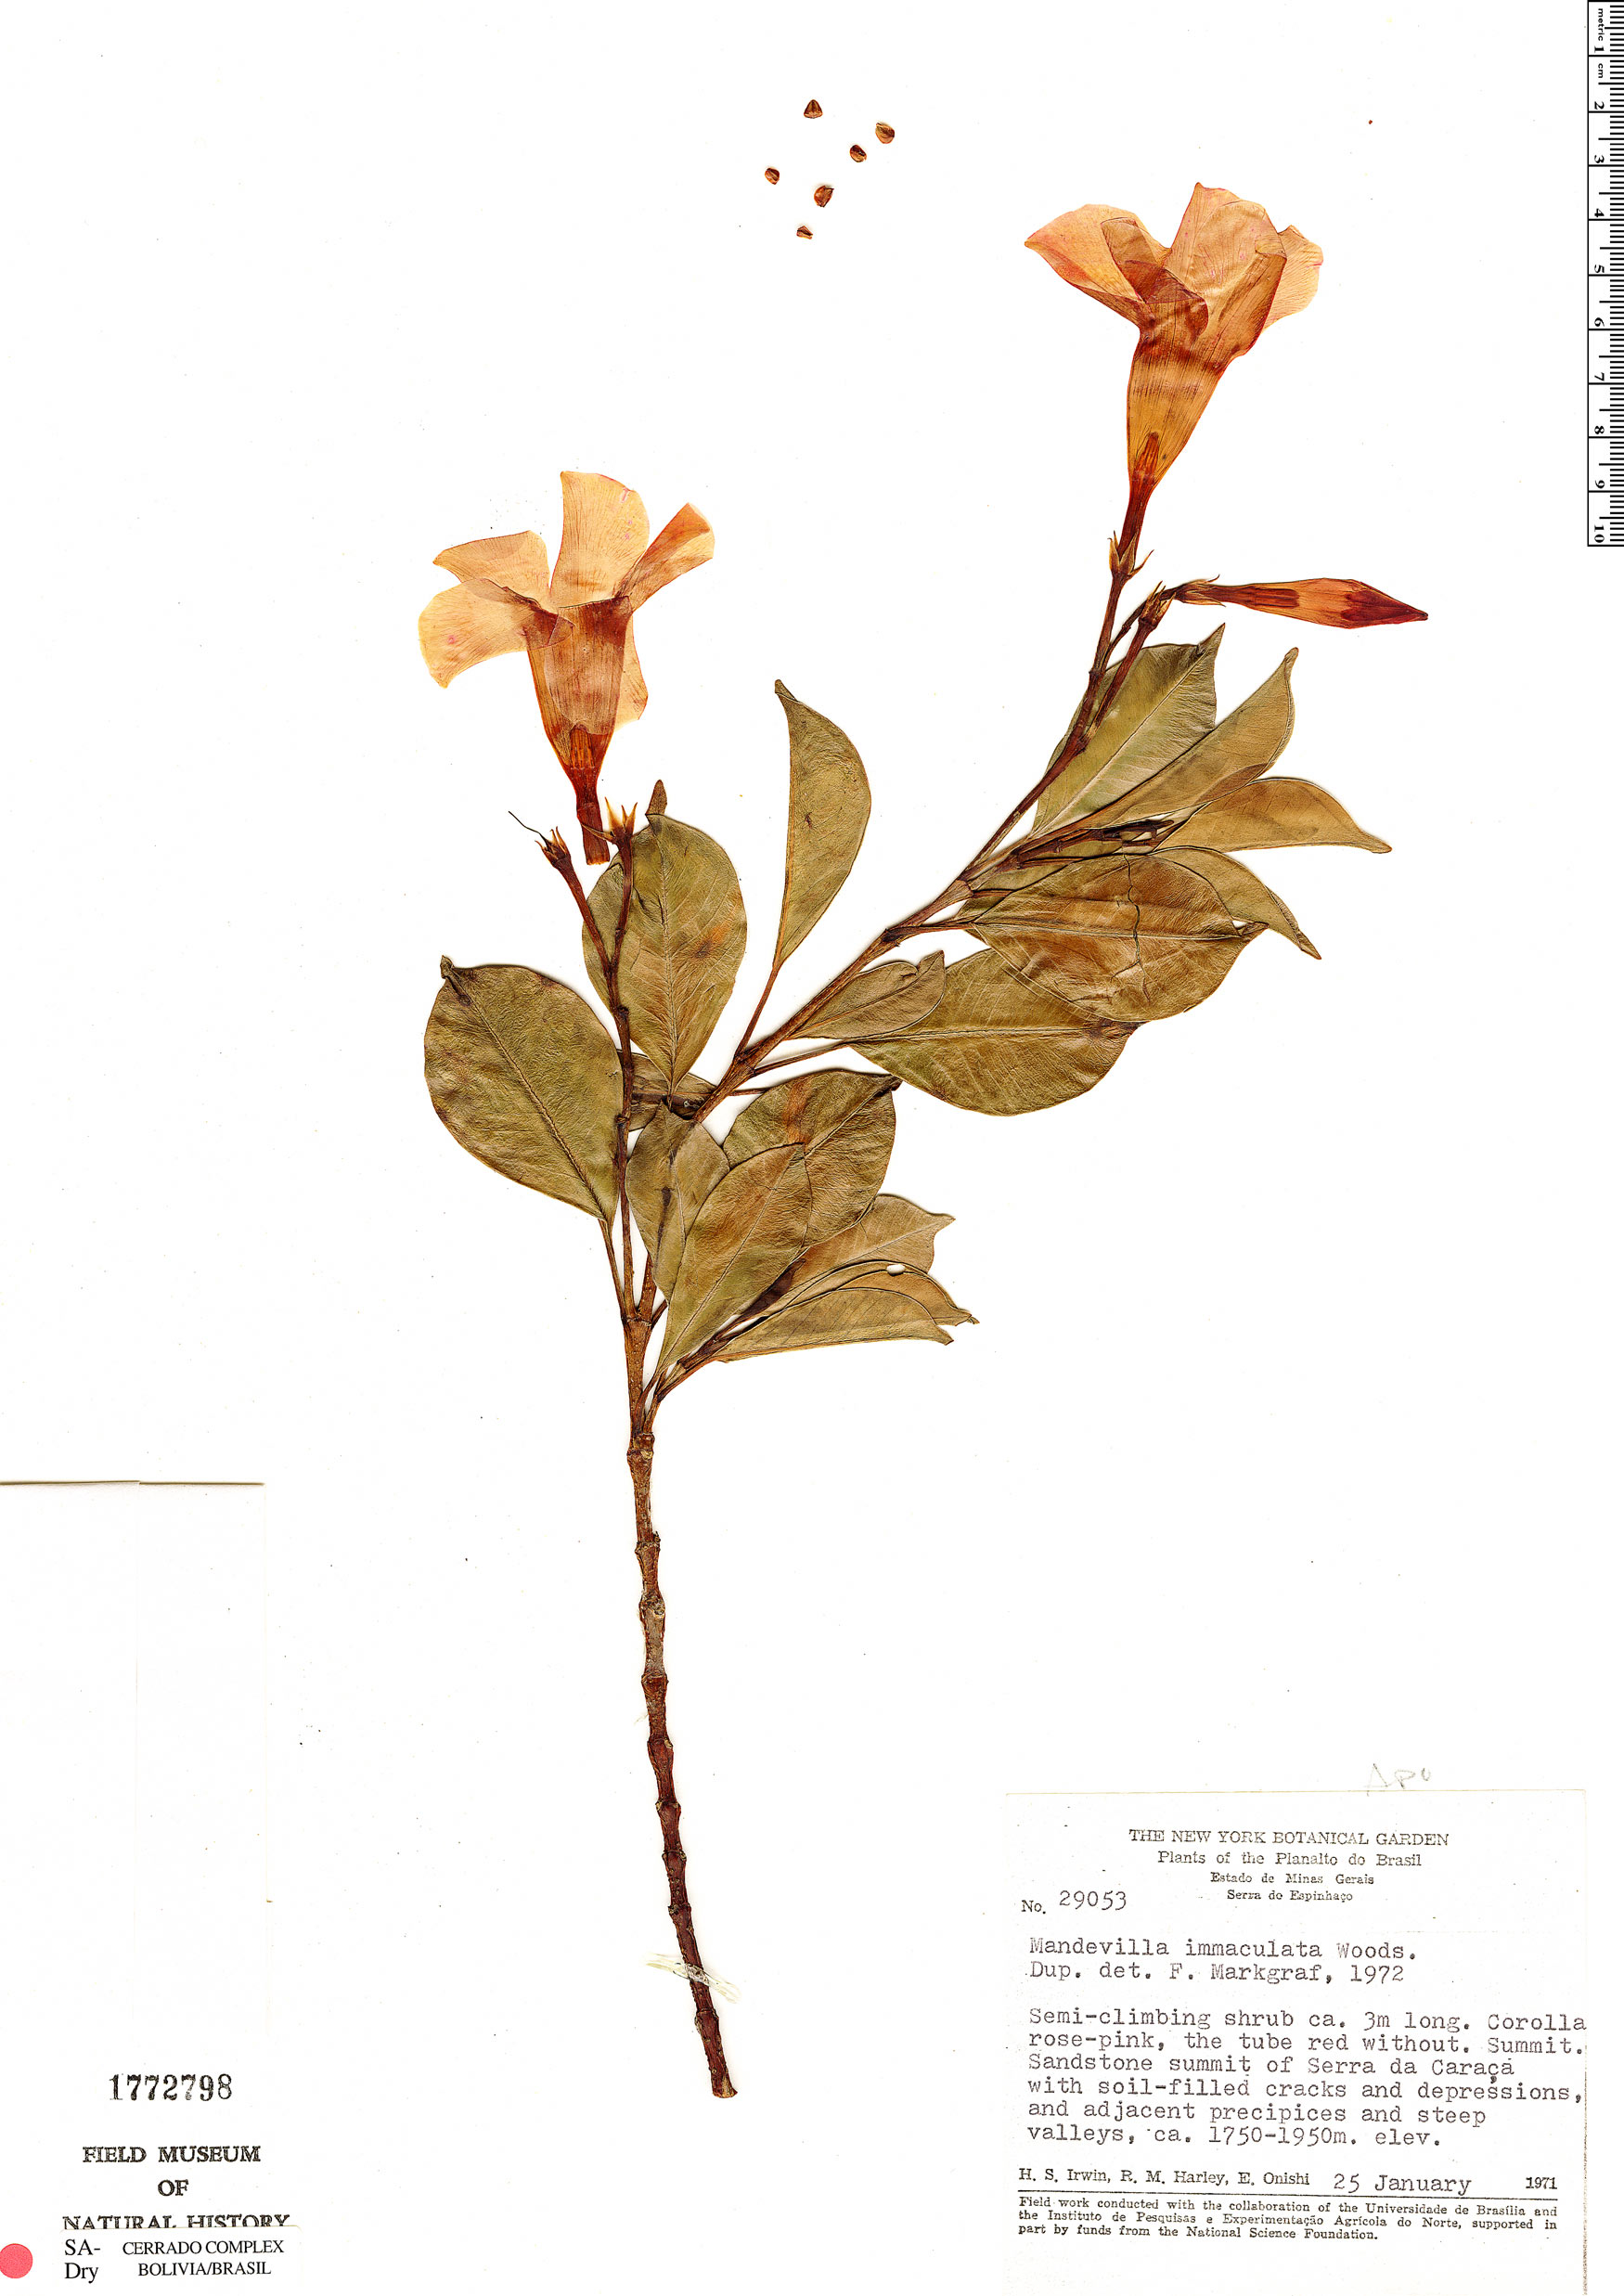 Specimen: Mandevilla immaculata